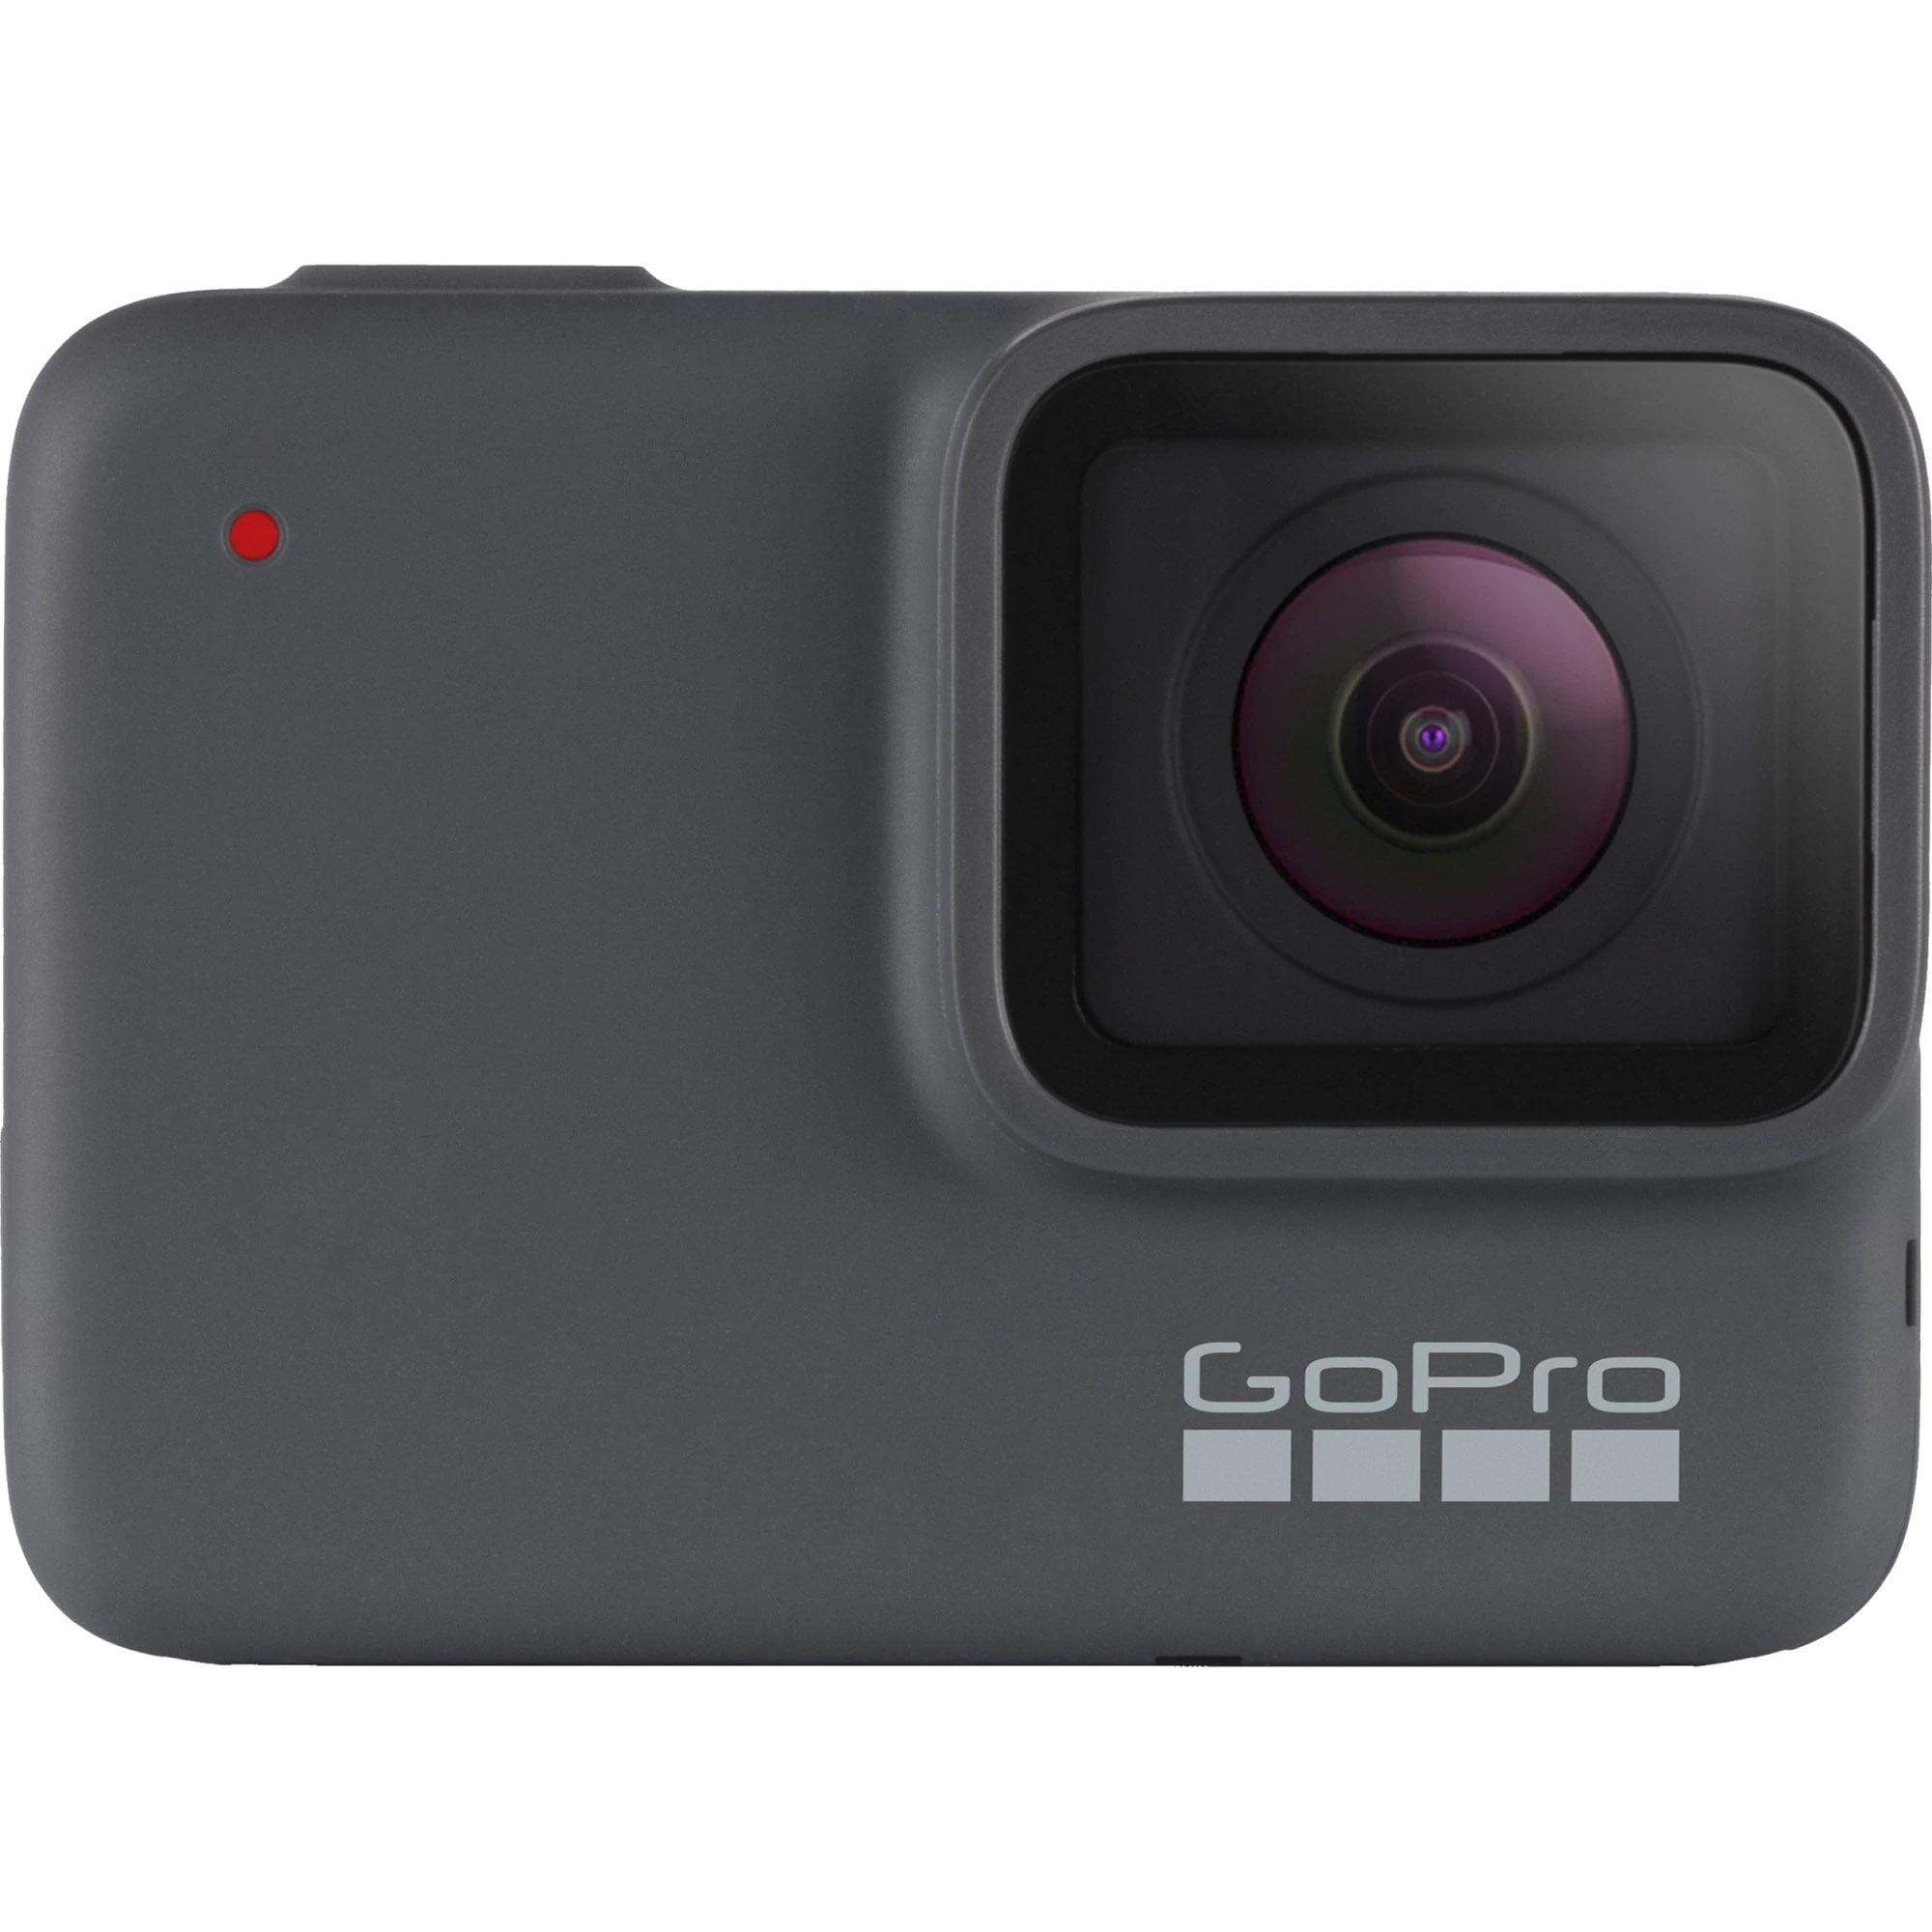 Camera video sport GoPro Hero 7, 4K, GPS, Silver Edition